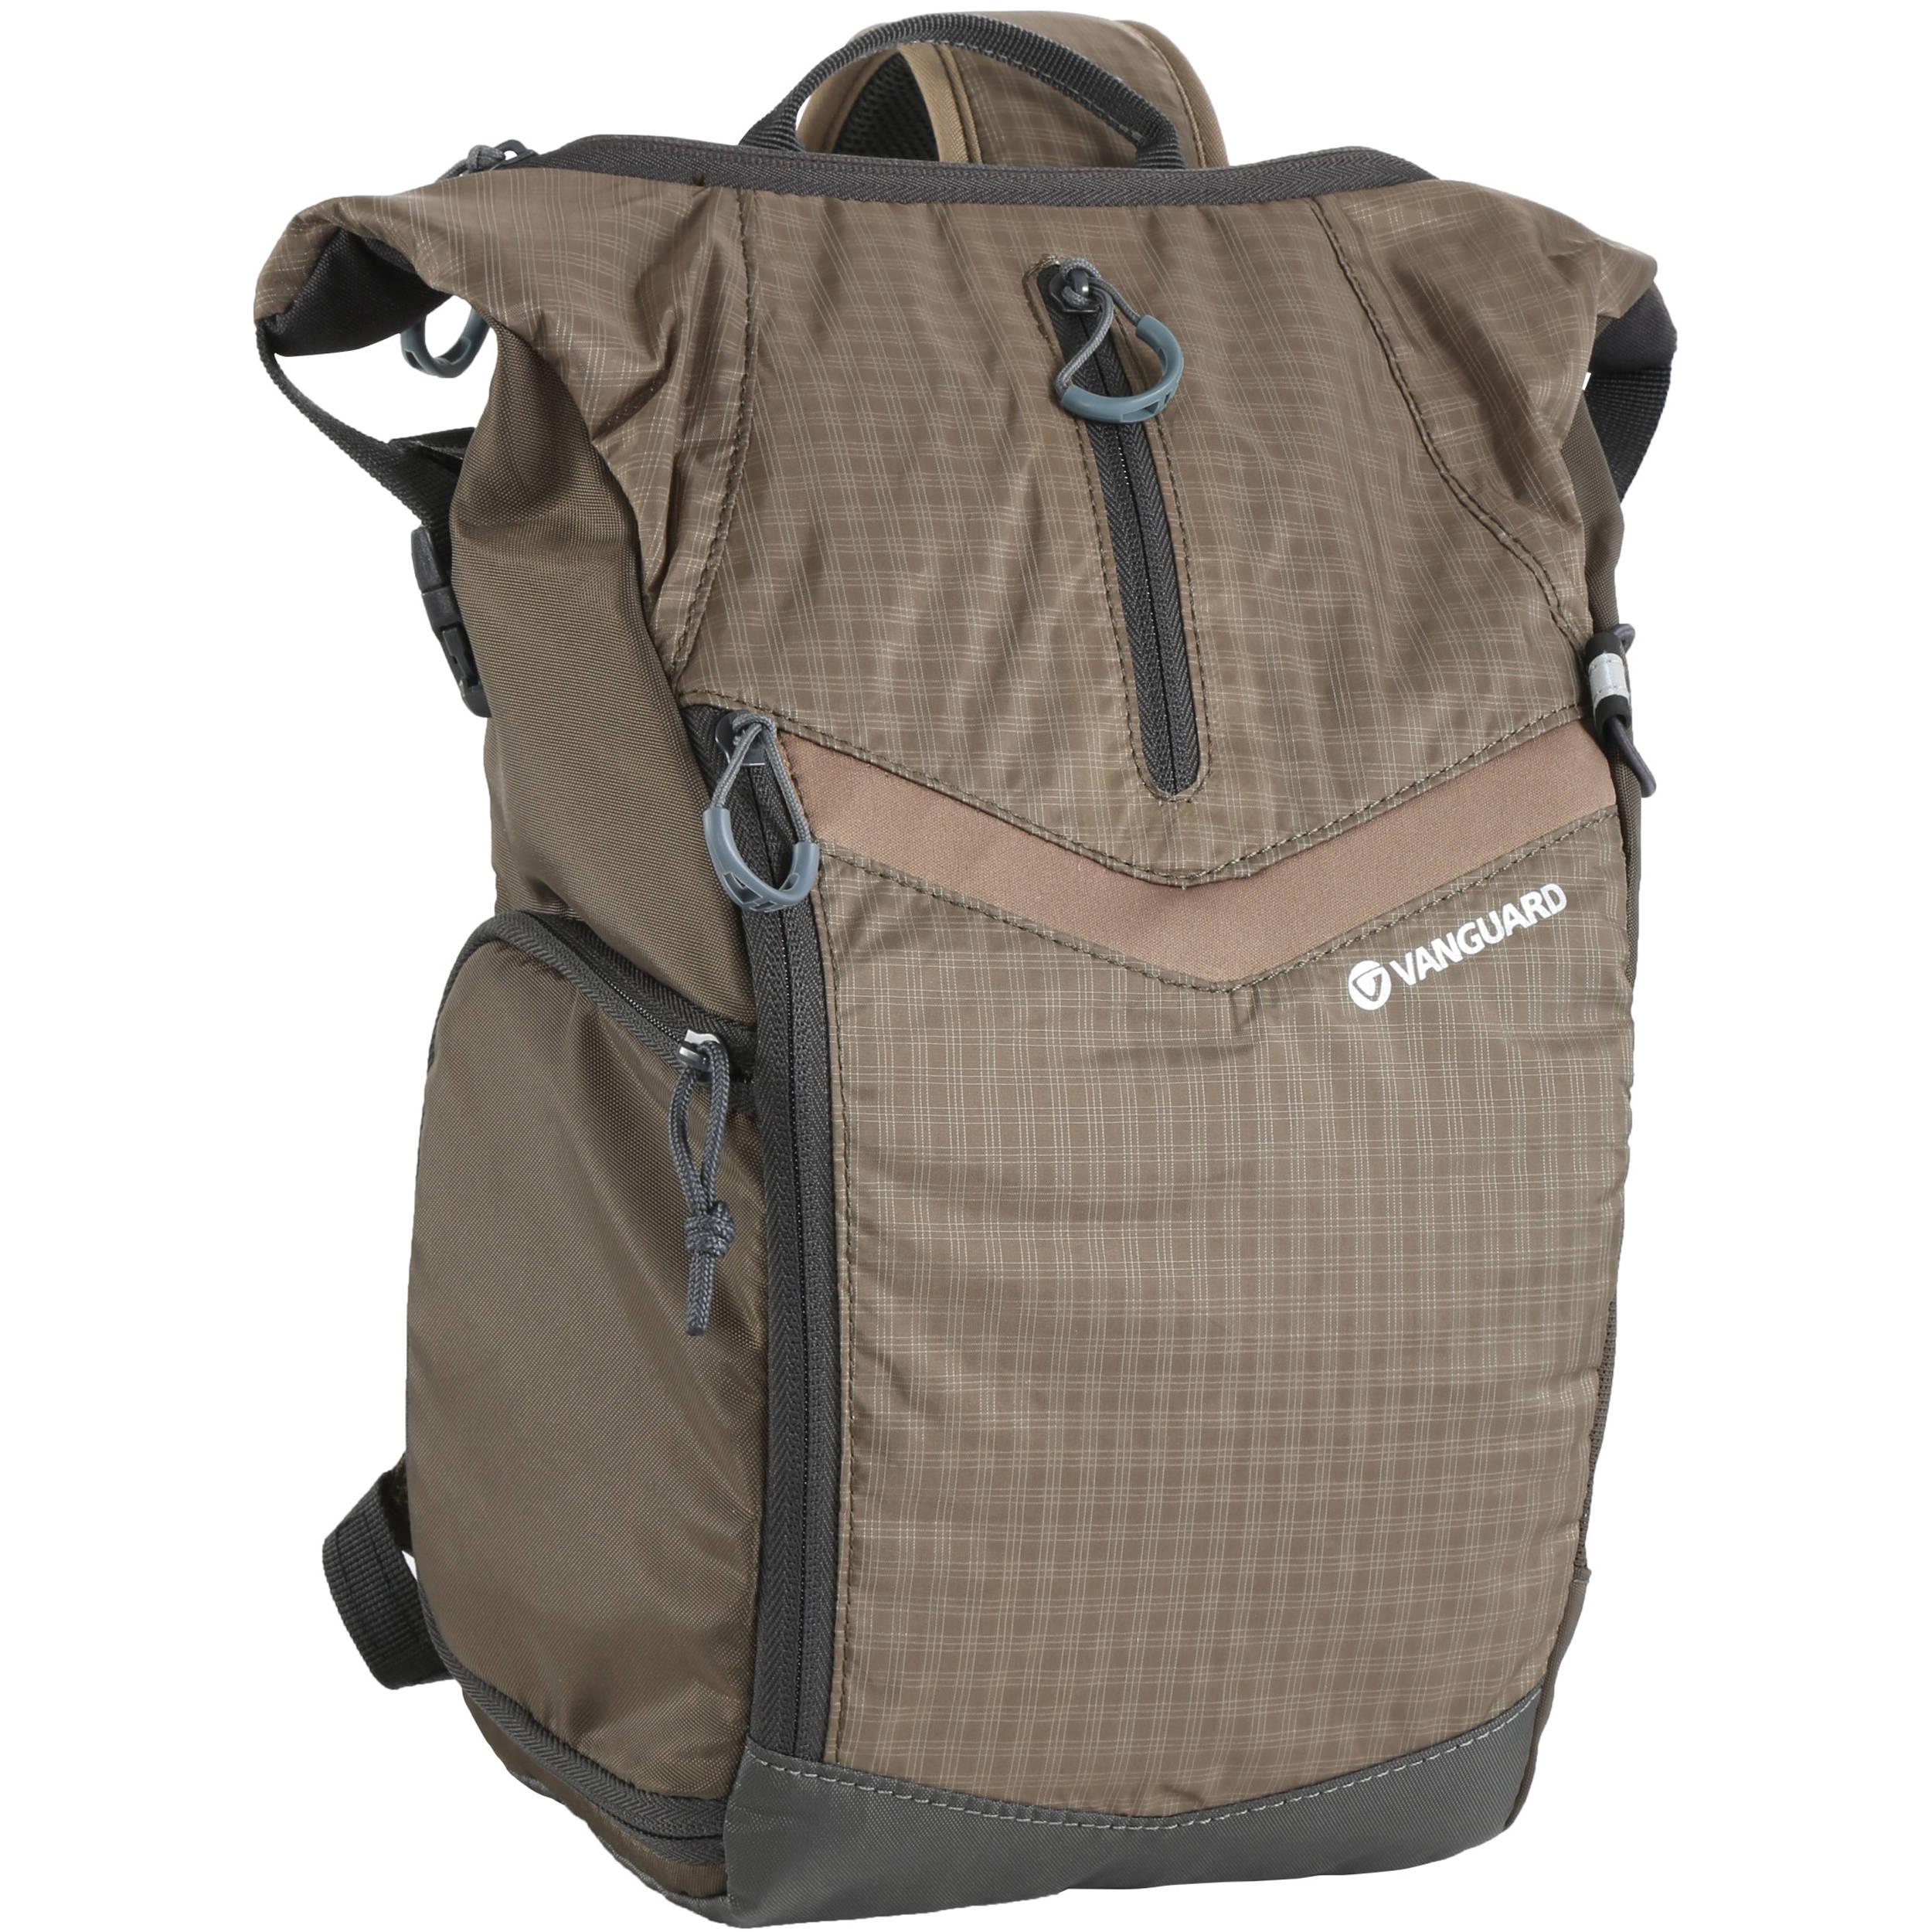 Vanguard Reno 34 DSLR Sling Bag (Khaki Green) RENO 34KG B&H